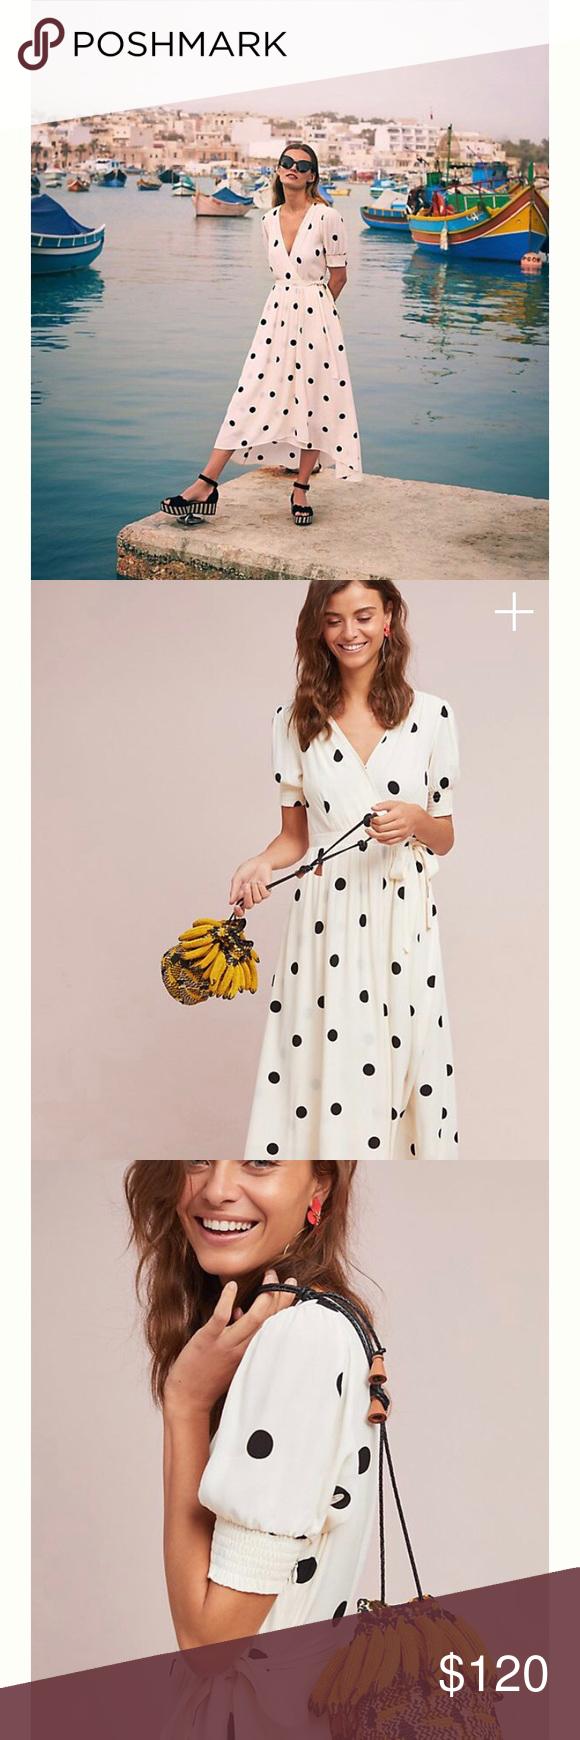 14f30f36c23e Anthropologie's Breanna Polka Dot Wrap Dress Anthropologie's Maeve brand.  Size 6. White and black